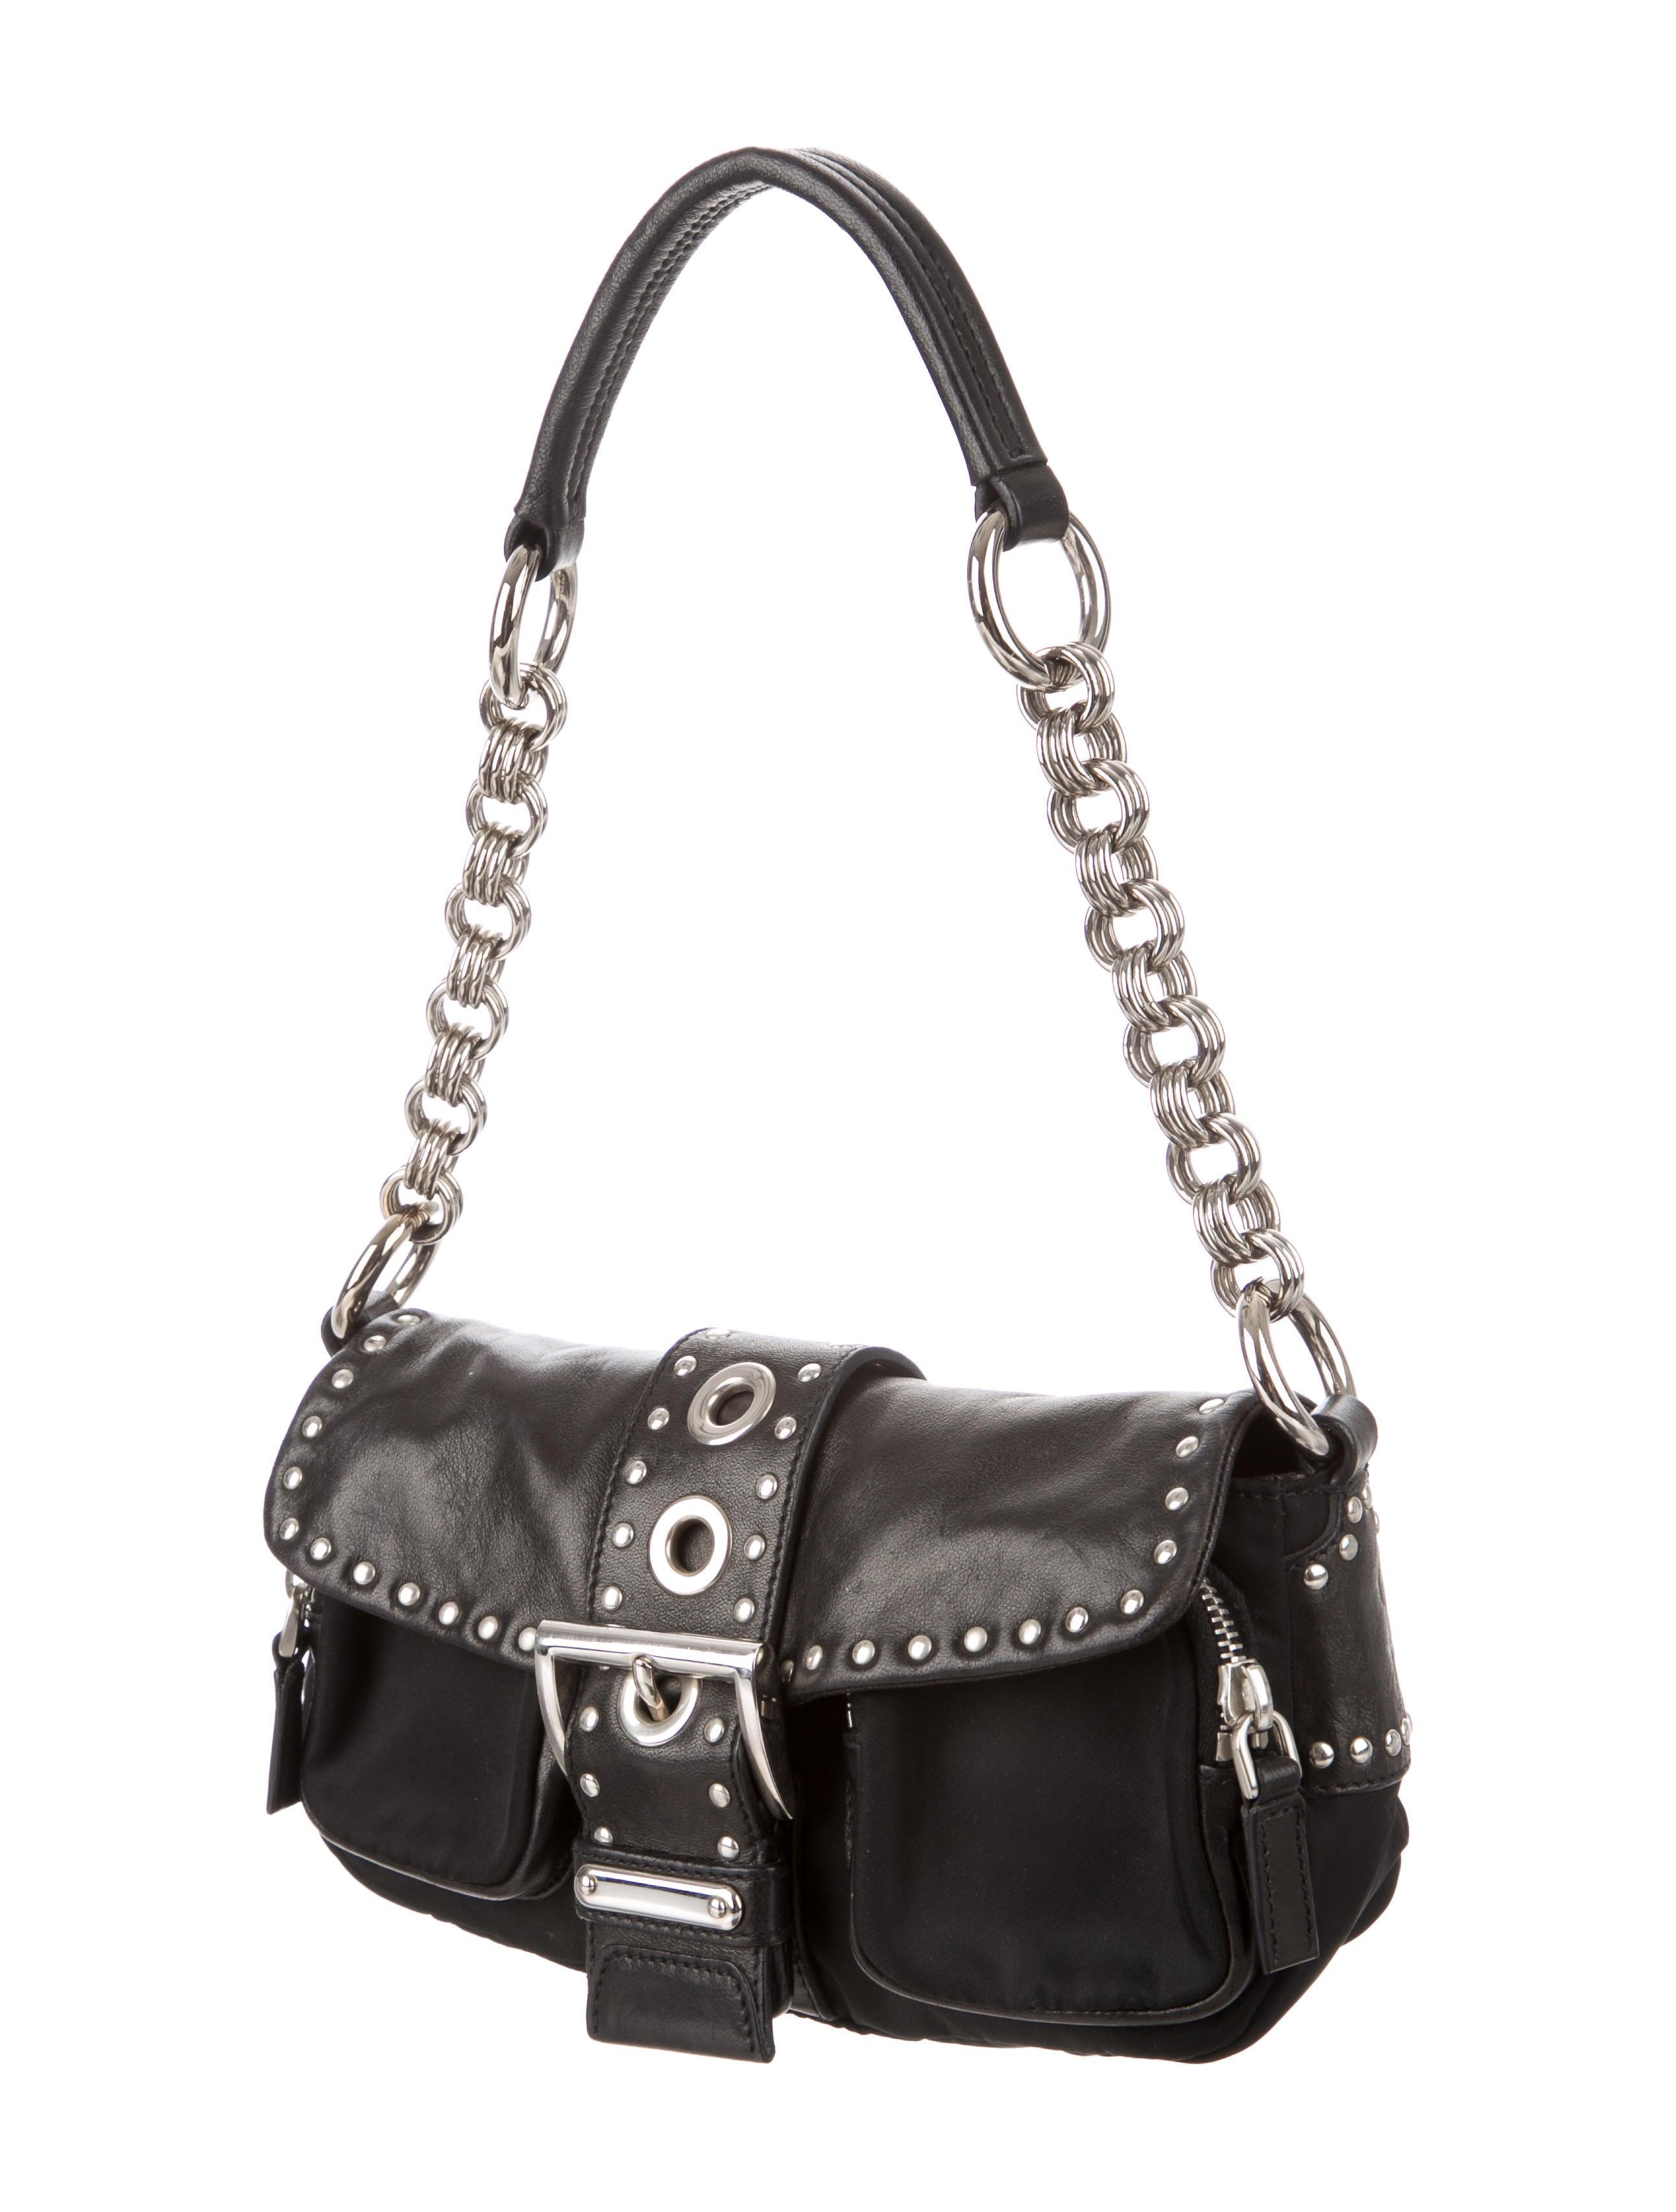 24942637d5b8 Prada Studded Leather & Tessuto Baguette - Handbags - PRA173602 | The  RealReal